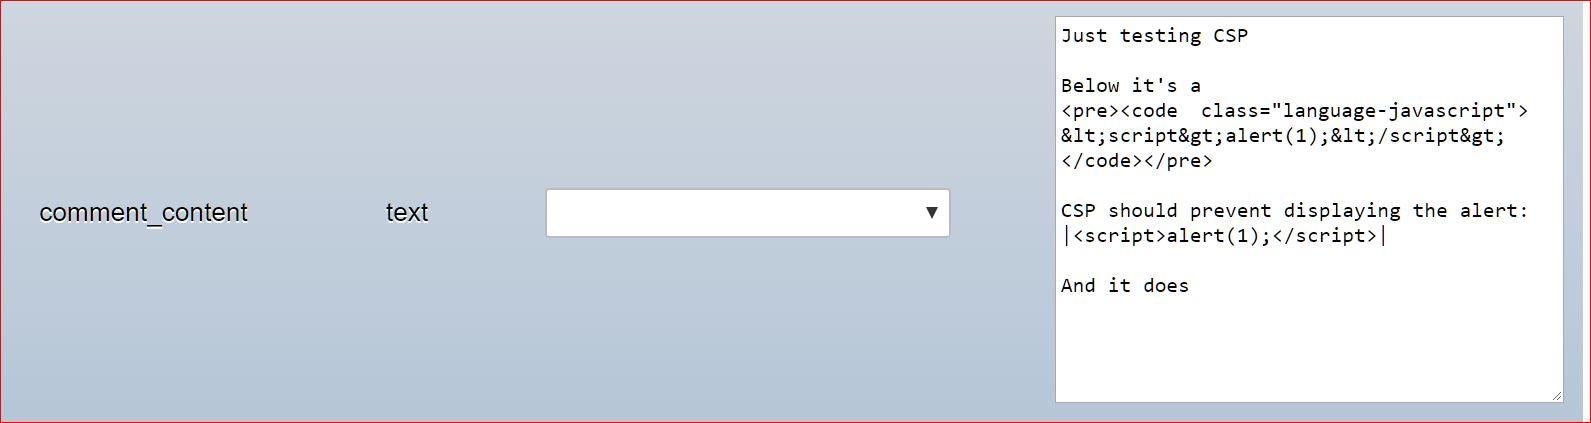 Making a Wordpress blog CSP-friendly